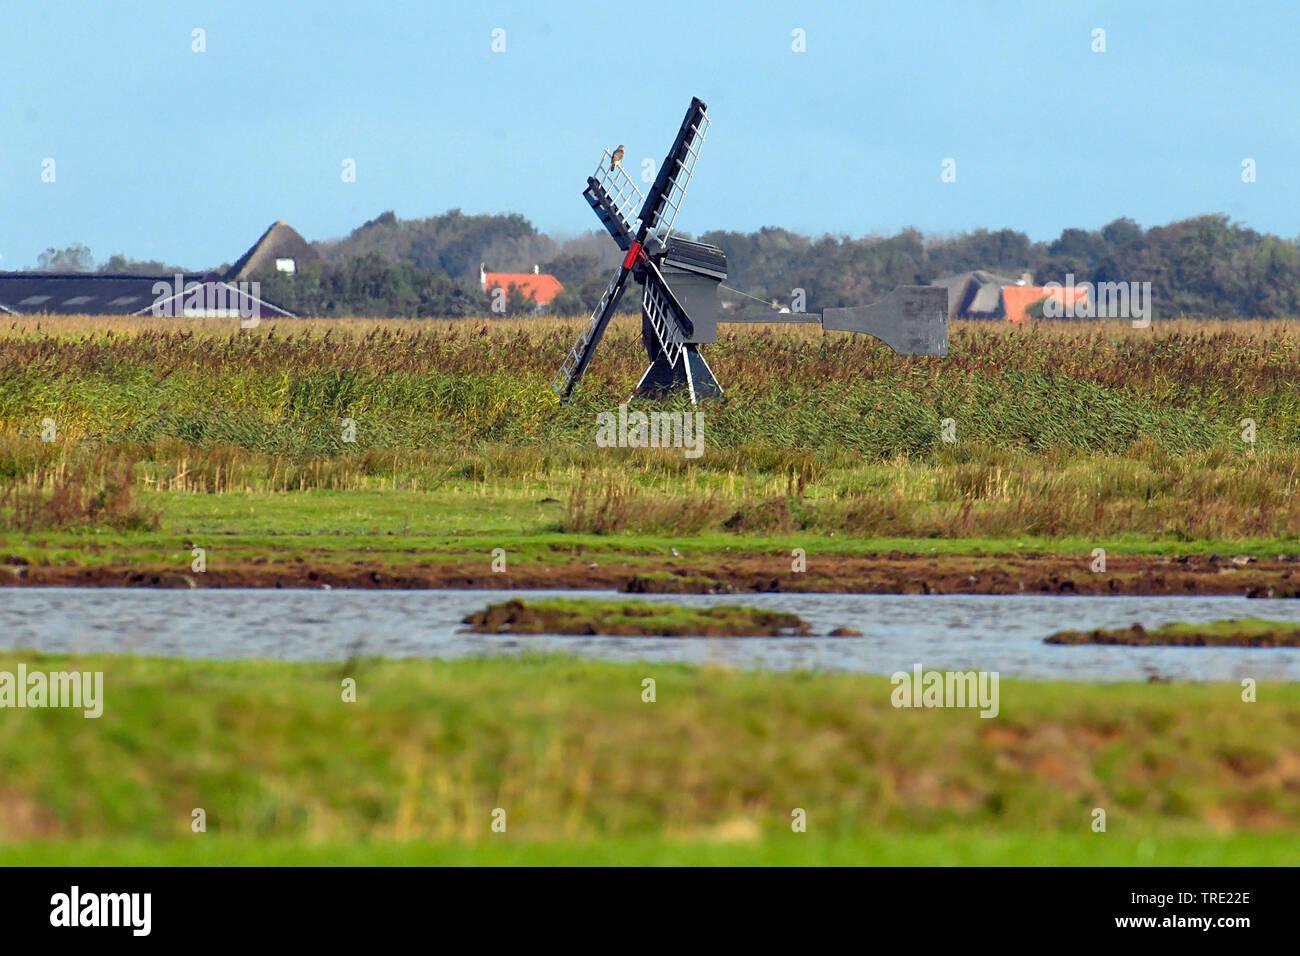 alte Bockwindmuehle im Naturreservat Dijkmanshuizen, Niederlande, Texel   Windmill at nature reserve Dijkmanshuizen, Netherlands, Texel   BLWS515063.j - Stock Image